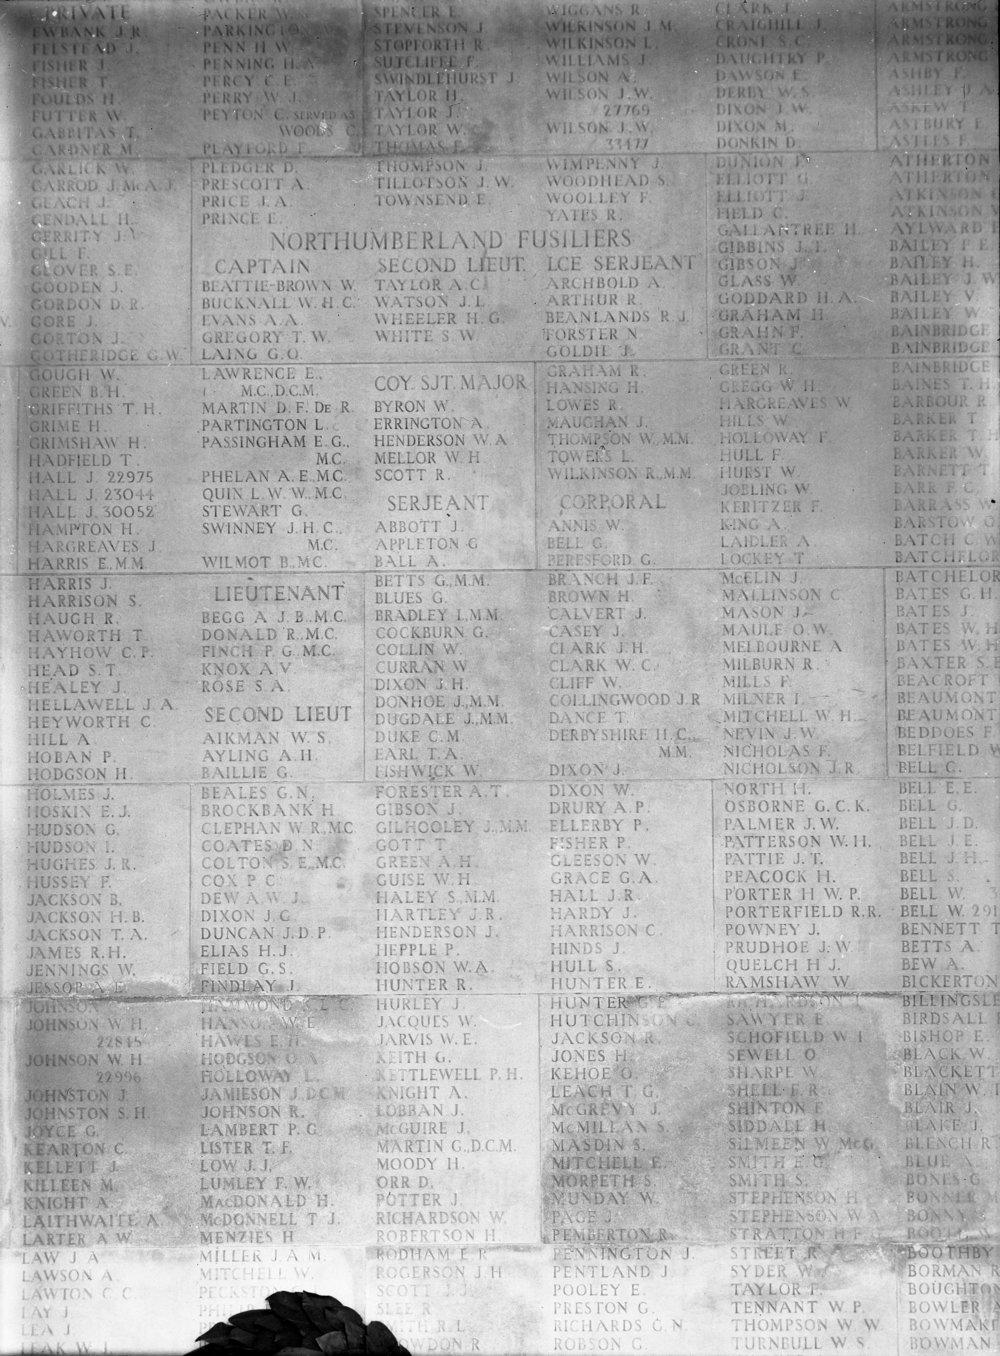 00867_001 - Arras Memorial Faubourg D'Amiens Cemetery Pas De Calais France.jpg